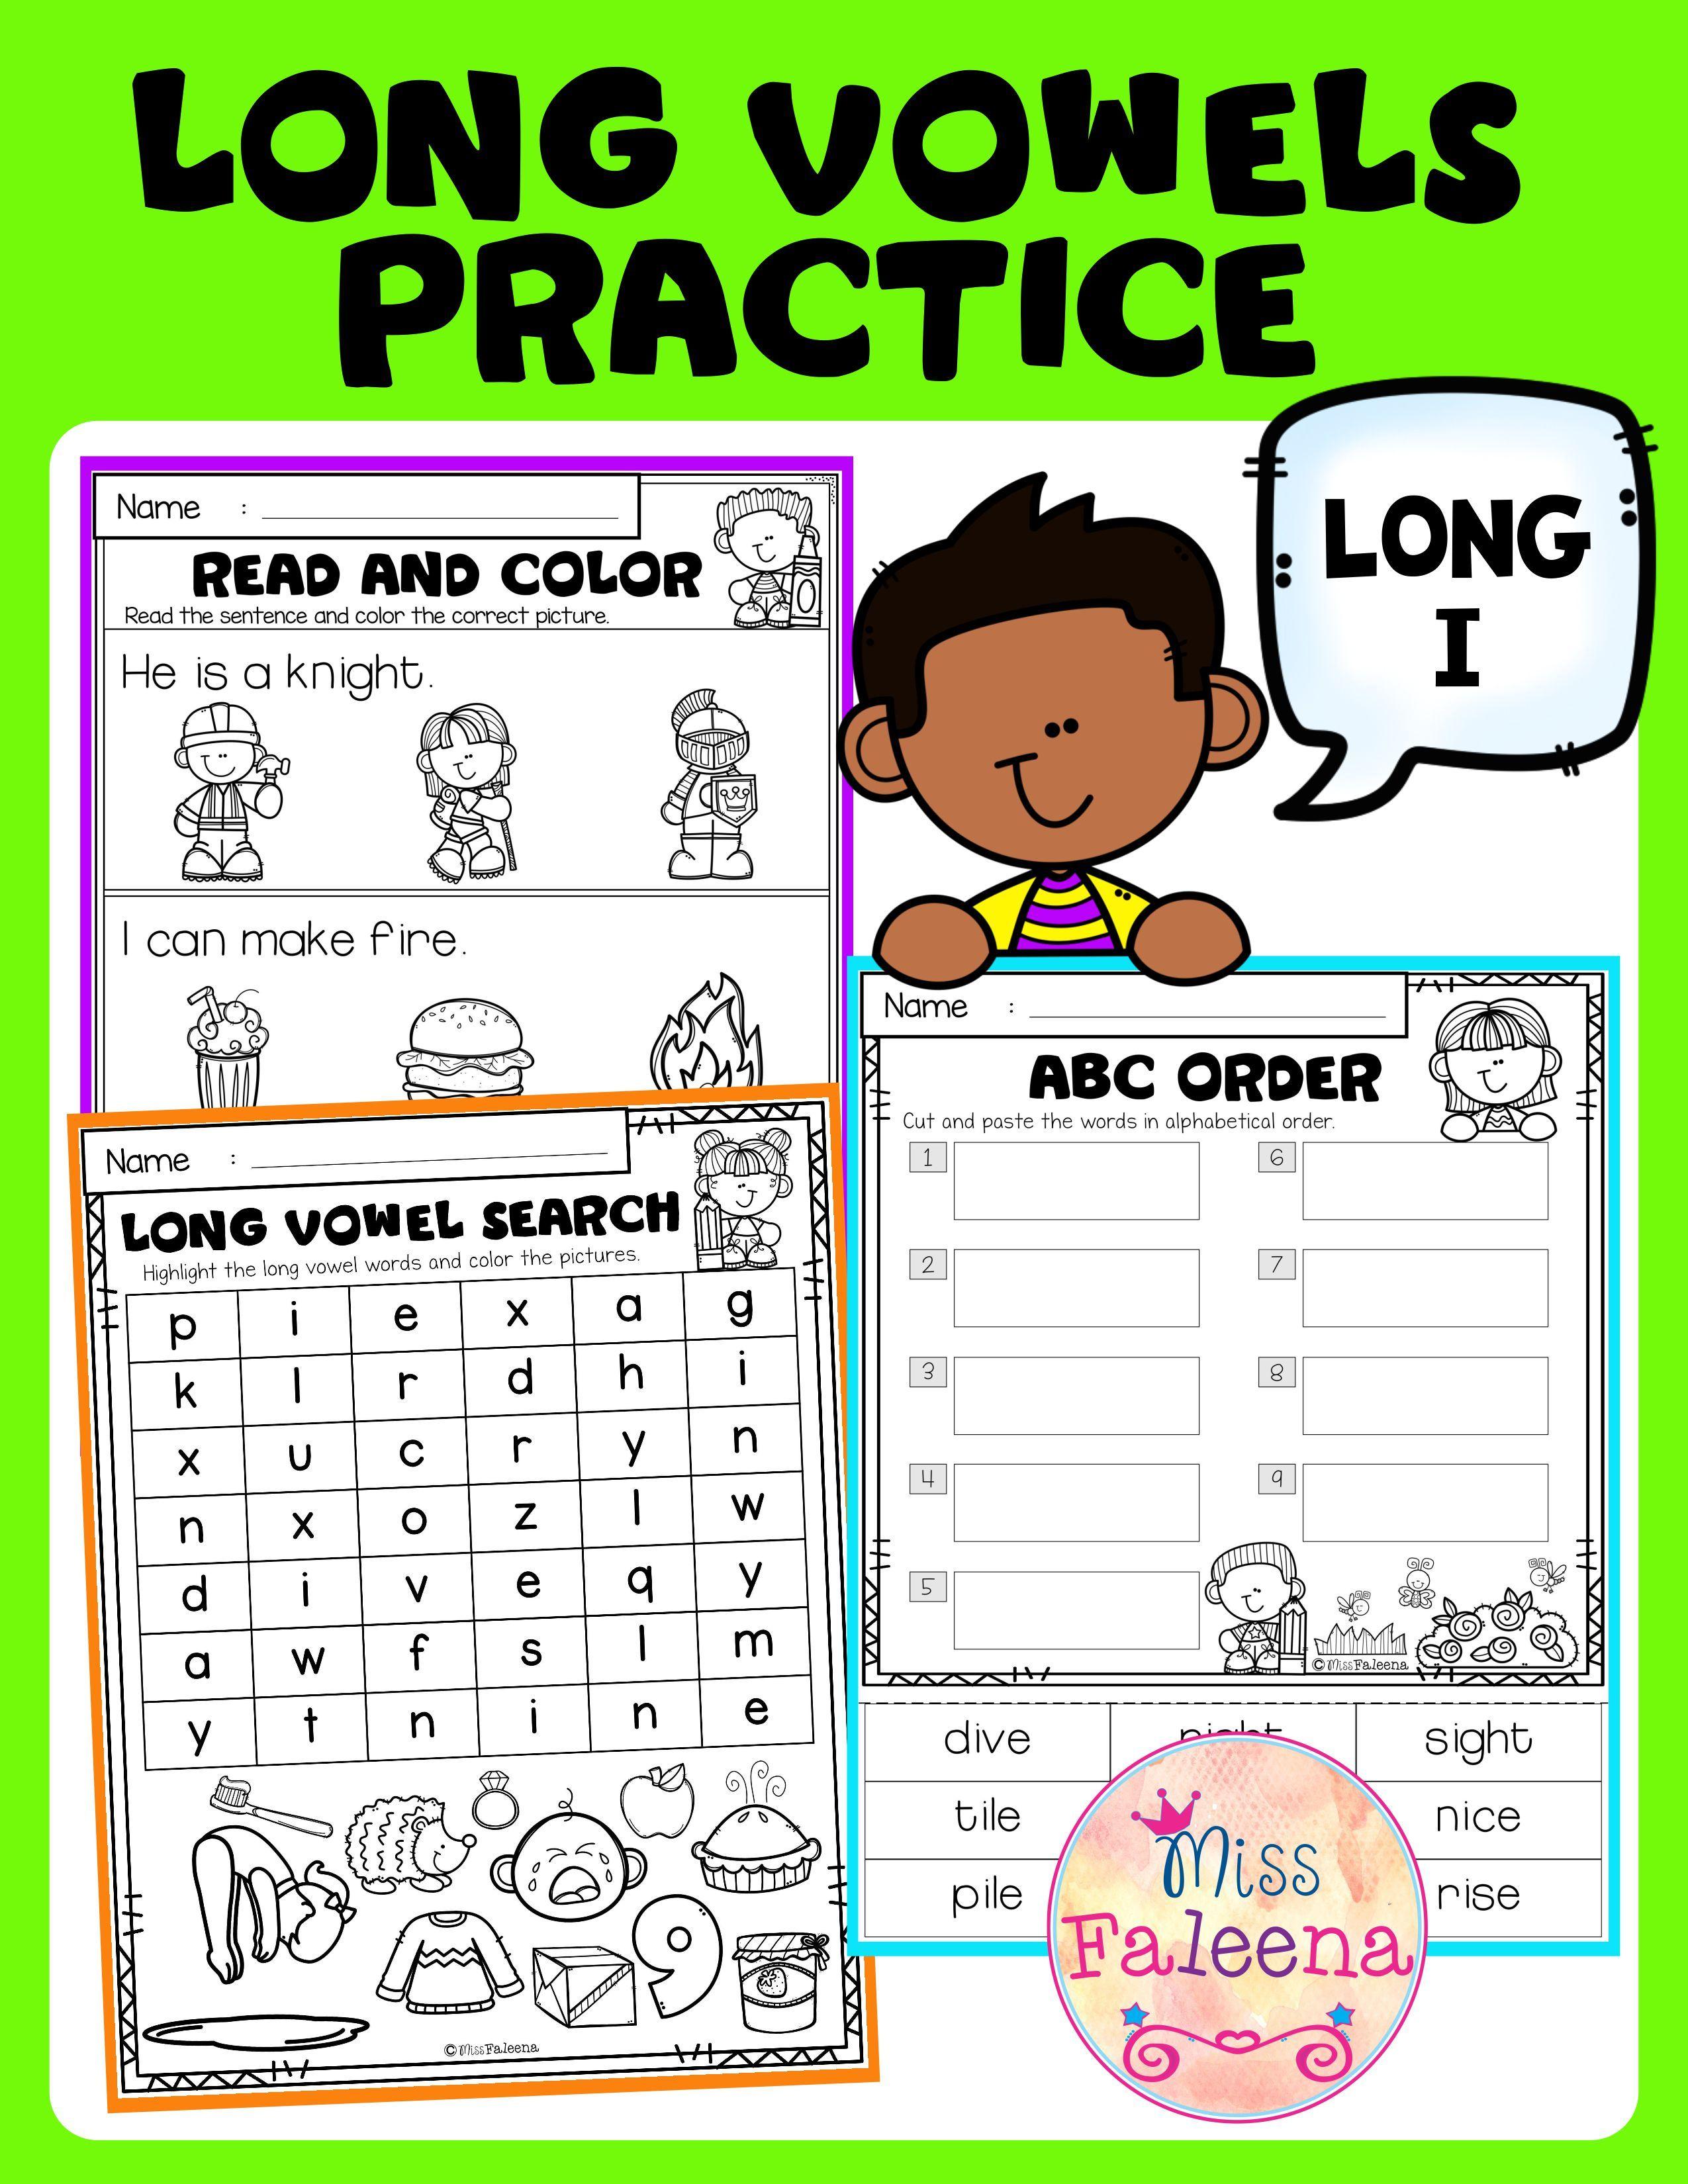 Long Vowel Practice Long I Vowel Practice Writing Sight Words Nonsense Words [ 3300 x 2550 Pixel ]